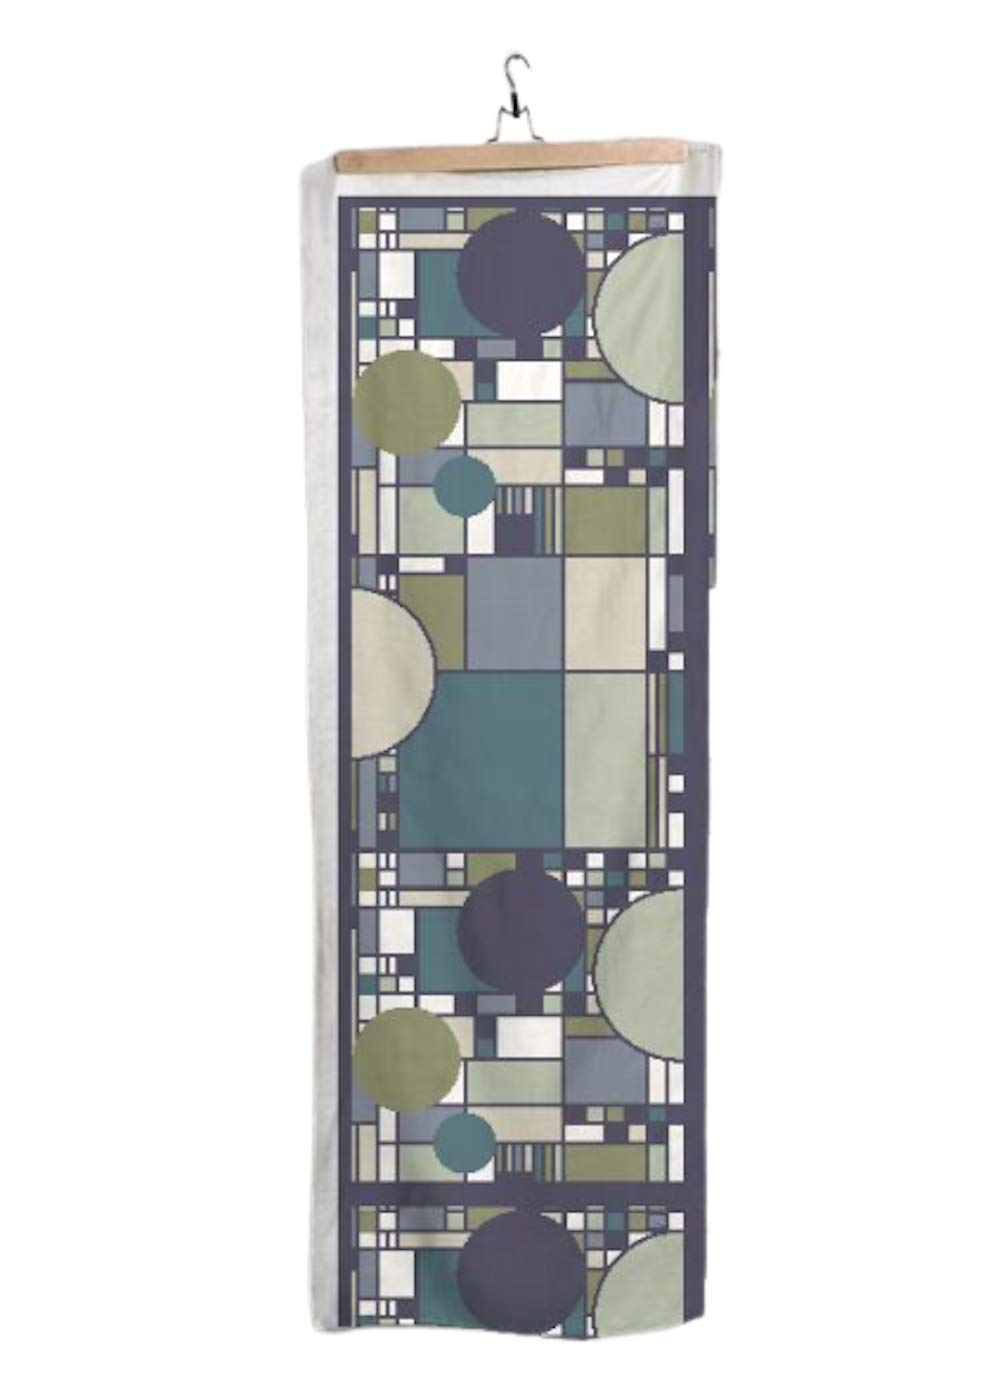 VIDA | Coonley Forest Scarf | Original Artwork Designed by Frank Lloyd Wright